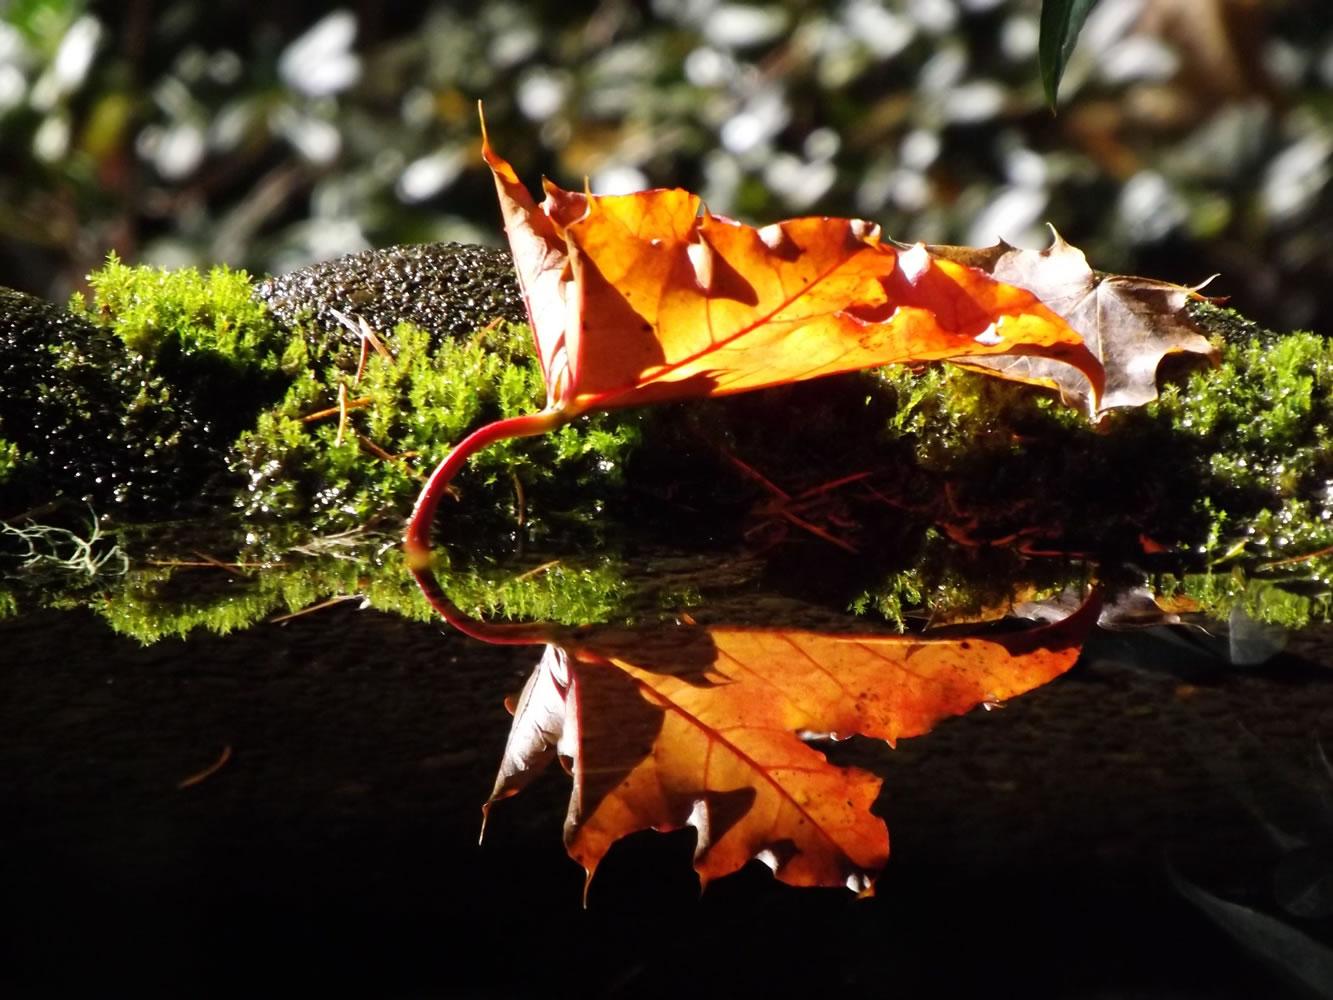 Reflection of fall in our birdbath. Photo taken 10/22/2015 in Hockinson.